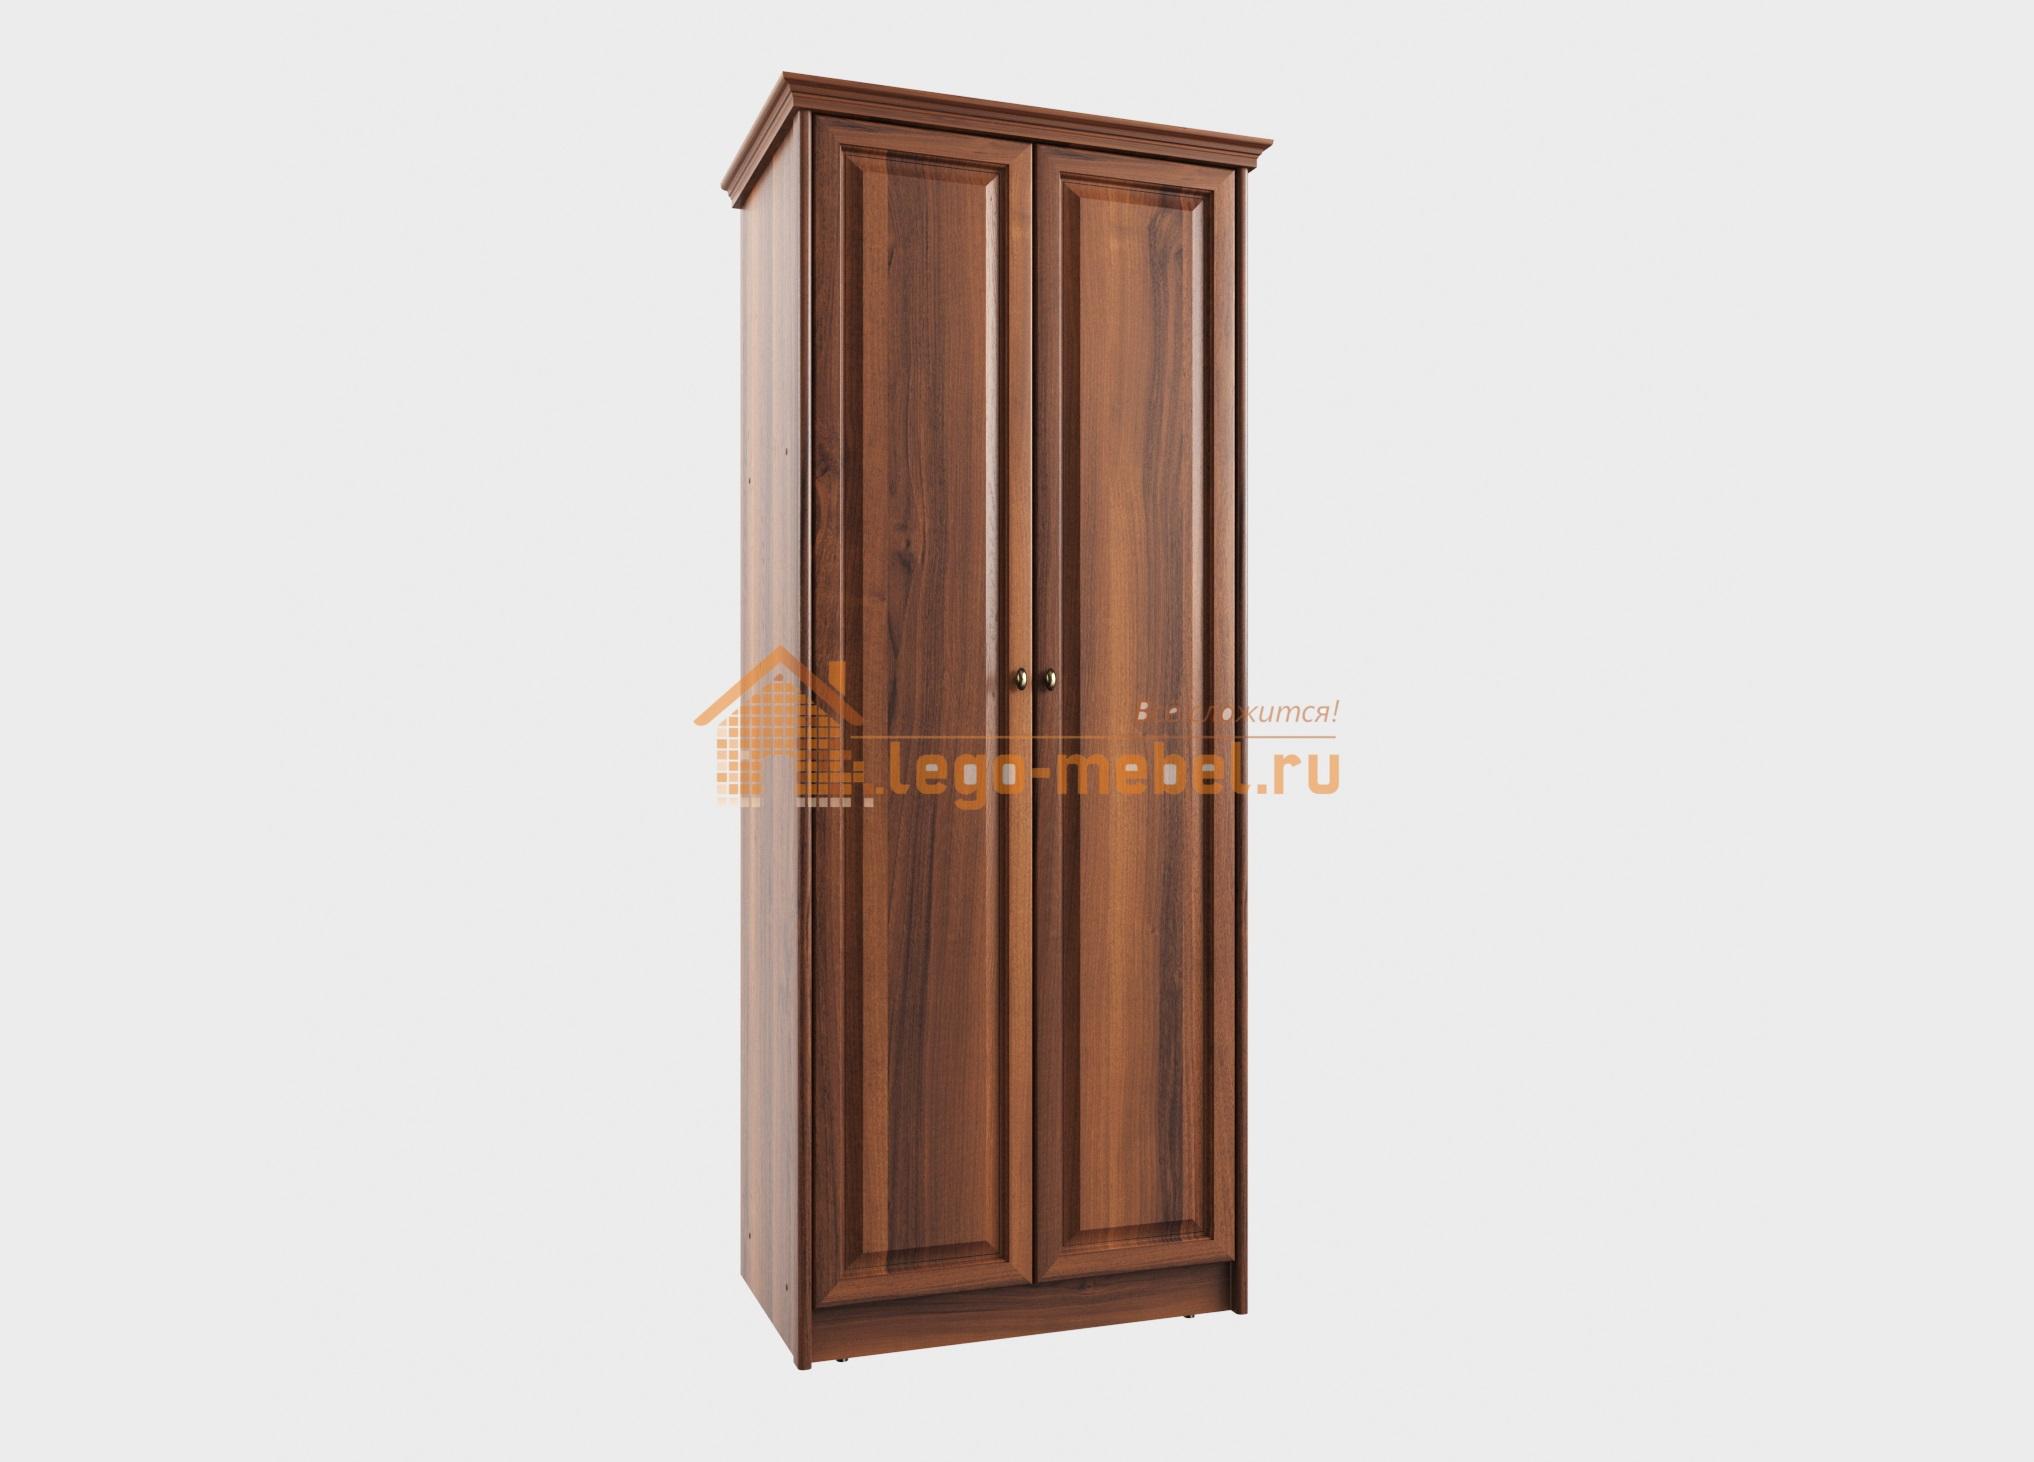 Янна ЯН-01 Шкаф для одежды со штангой